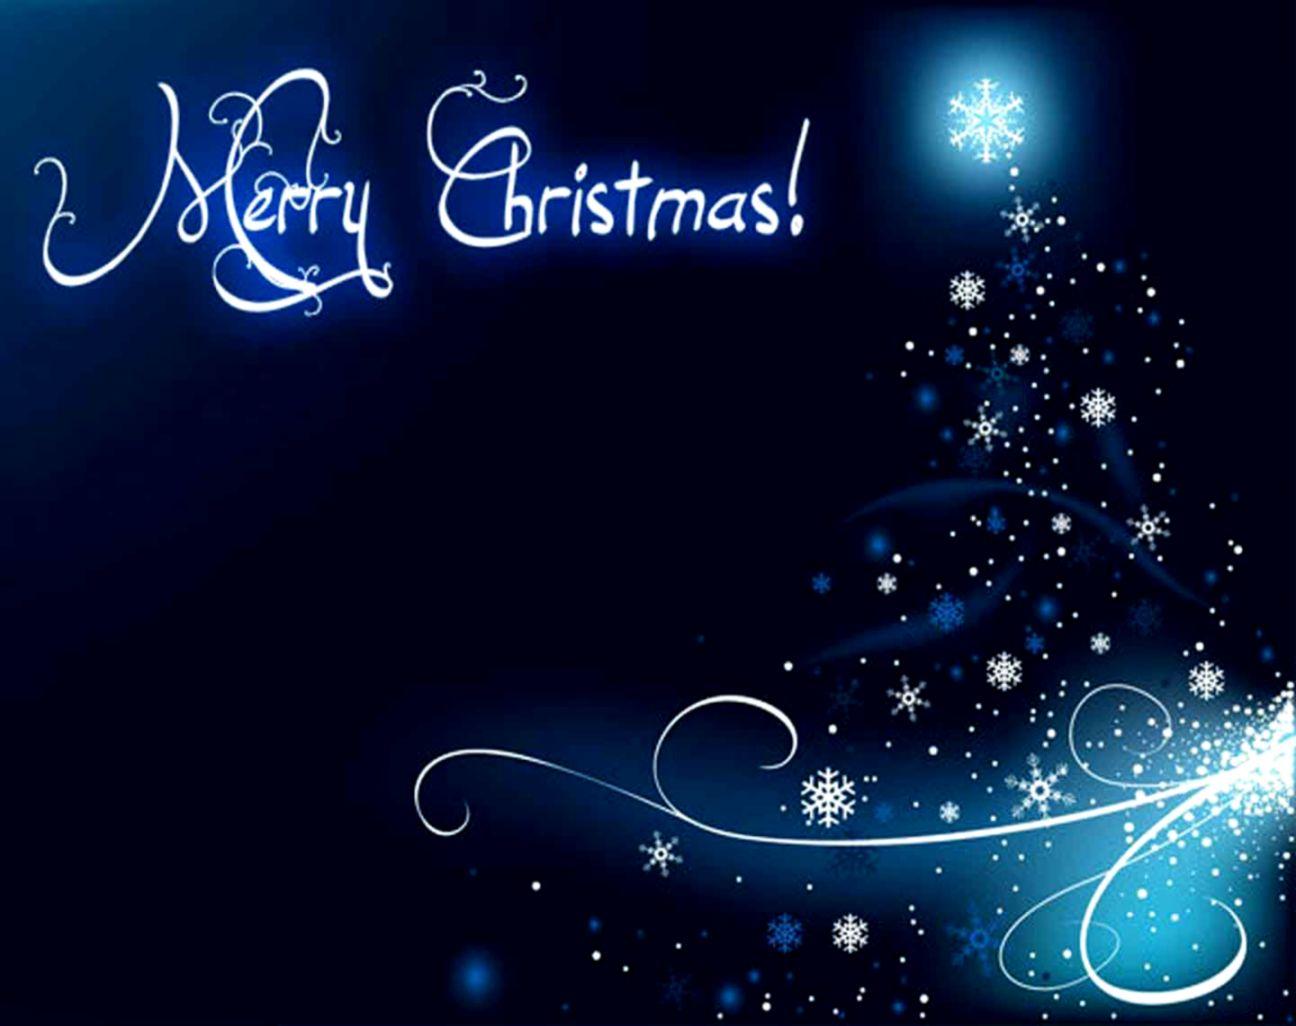 Merry Christmas Hd Desktop Link Wallpapers